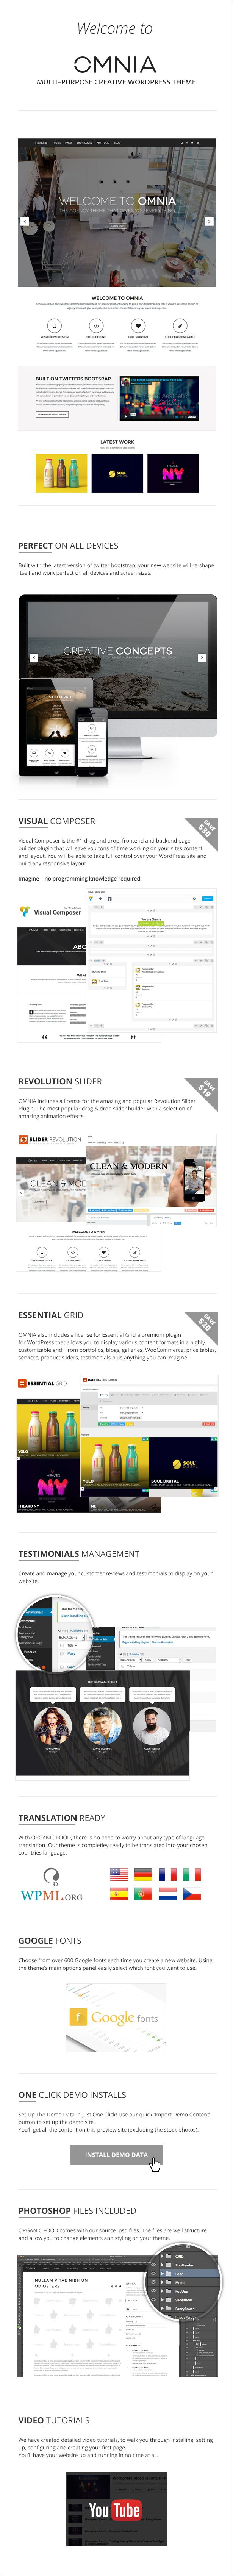 WordPress - OMNIA - Multipurpose, Creative Wordpress Theme | ThemeForest